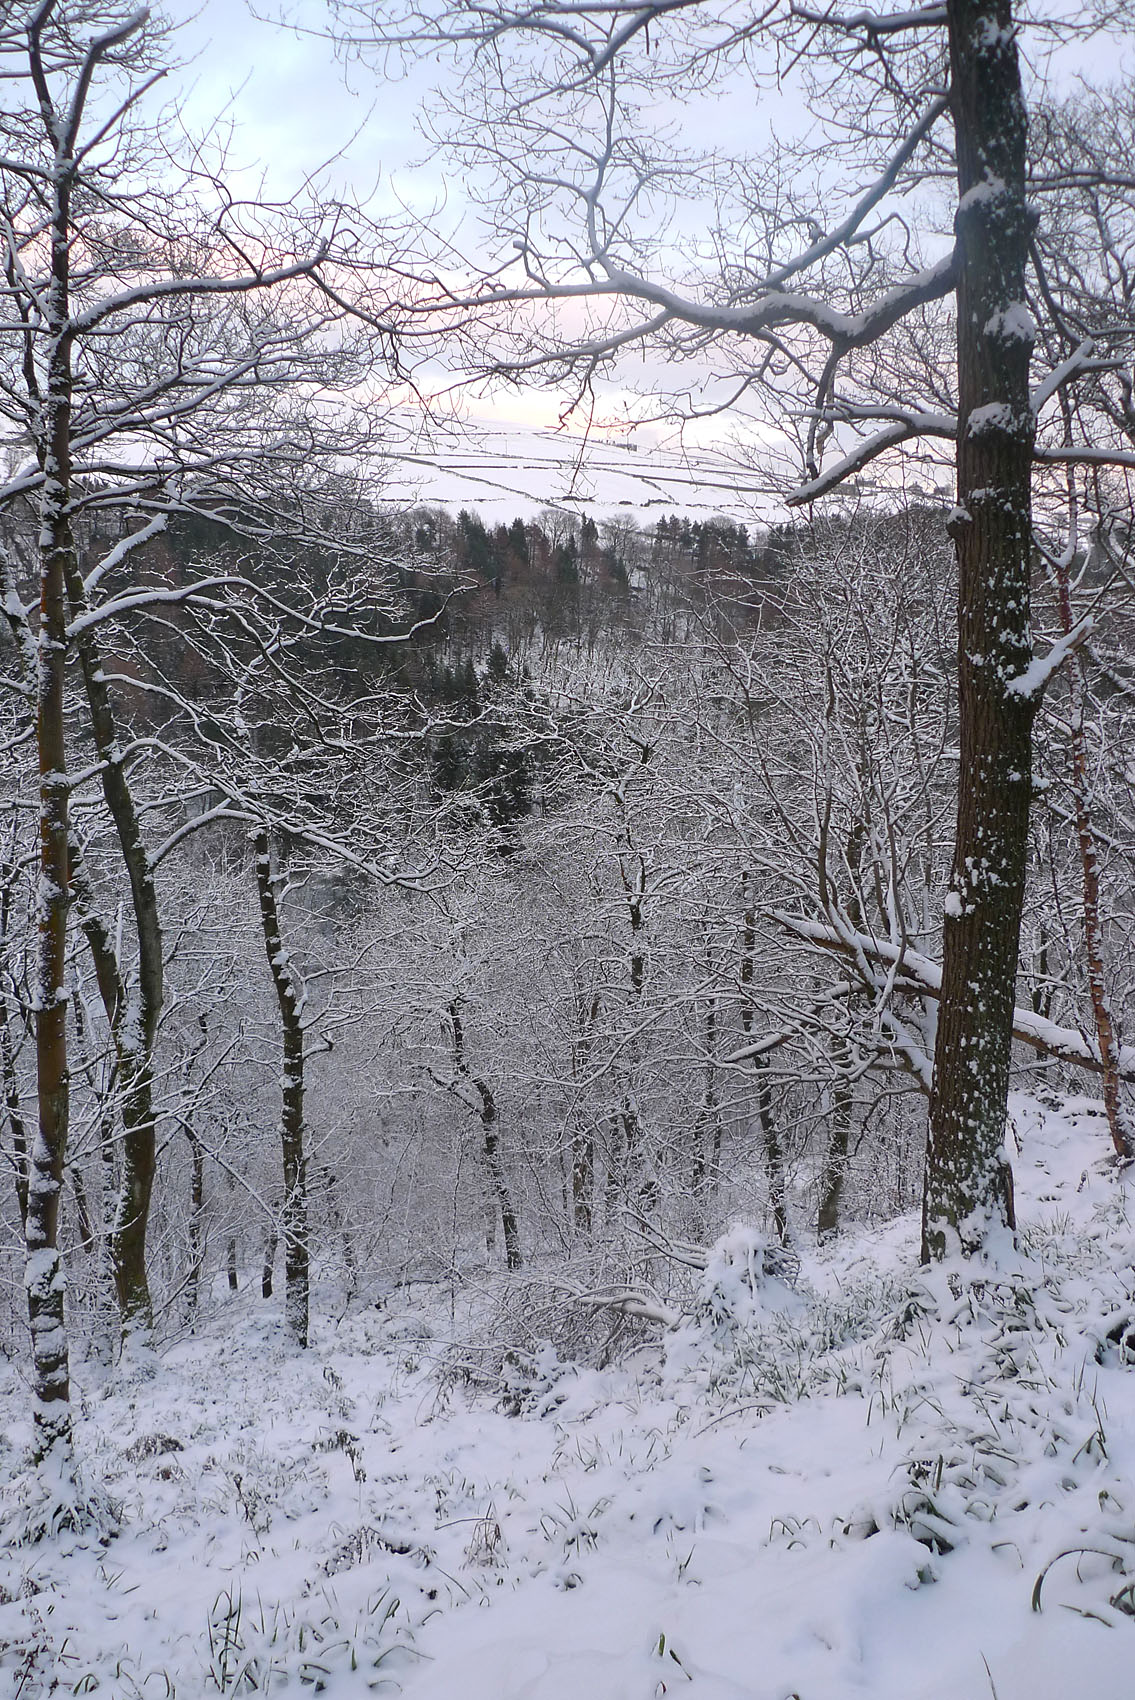 HebdenBridgeSnowyTrees